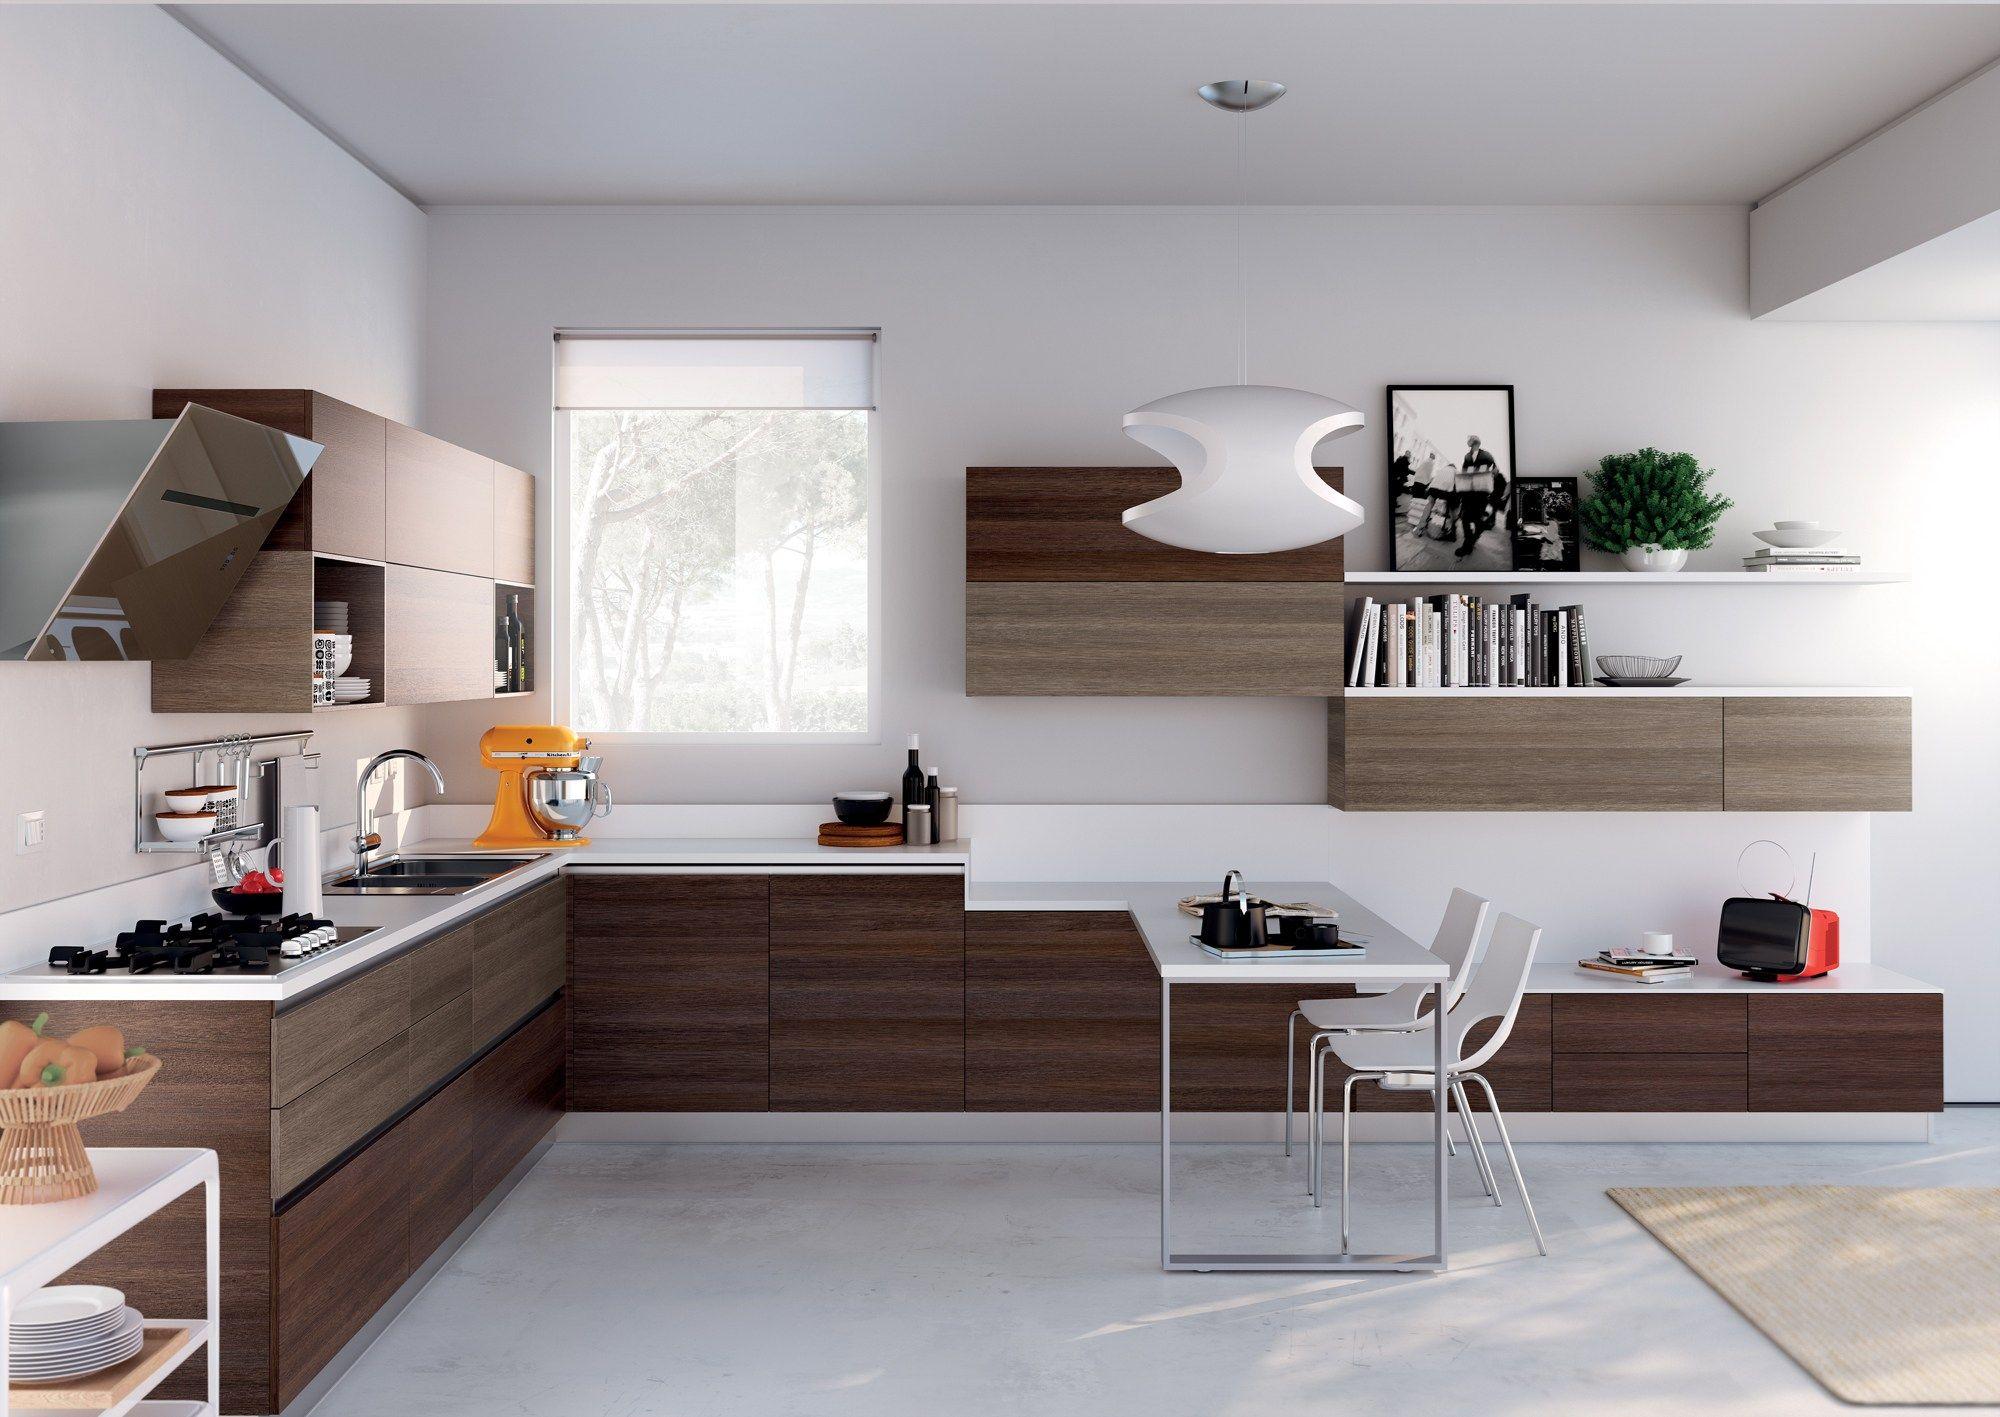 Scavolini Kitchens fitted kitchen evolution scavolini basic linescavolini